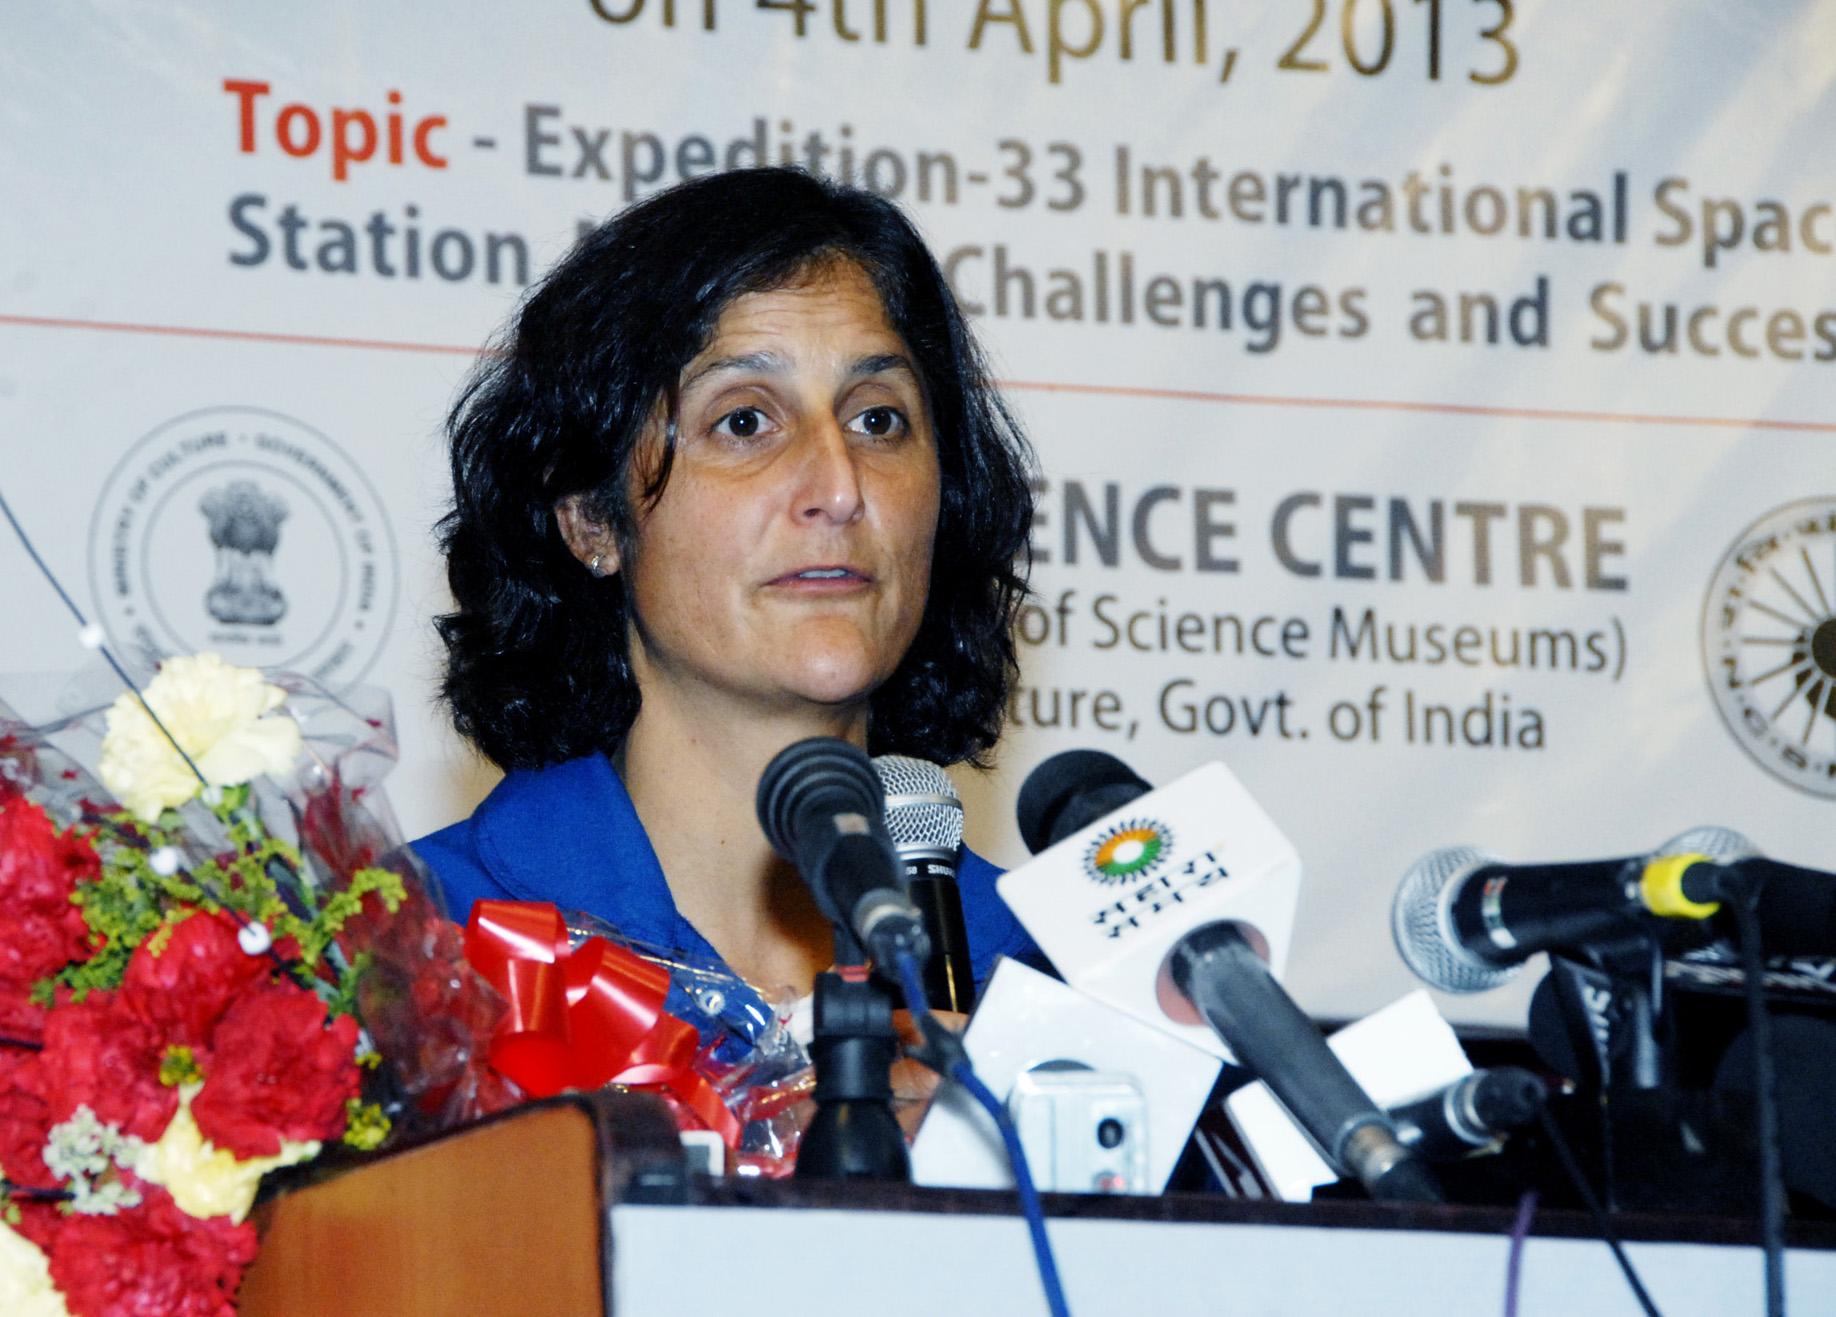 sunita williams speech